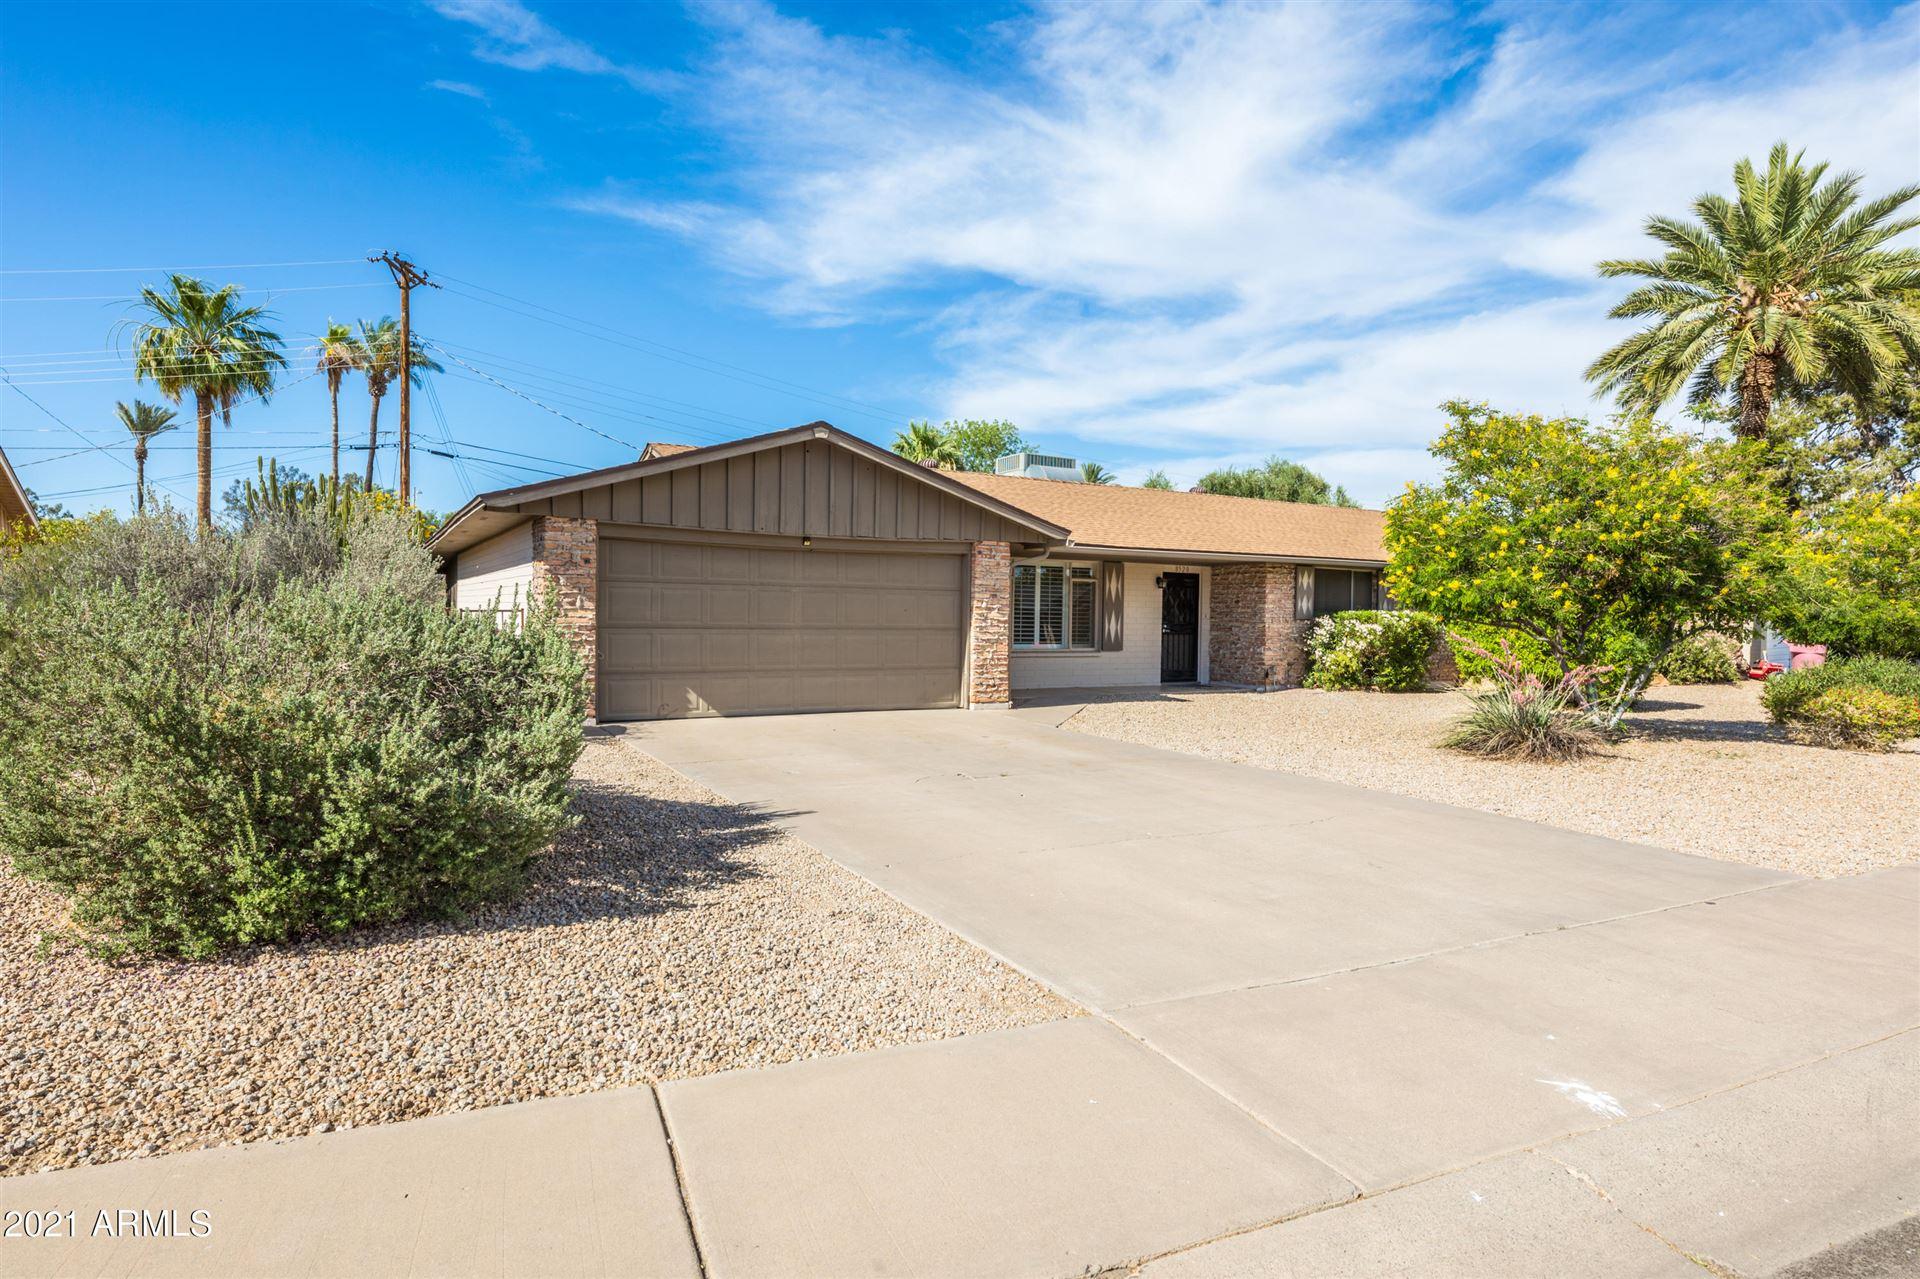 Photo of 8520 E Roma Avenue, Scottsdale, AZ 85251 (MLS # 6249780)